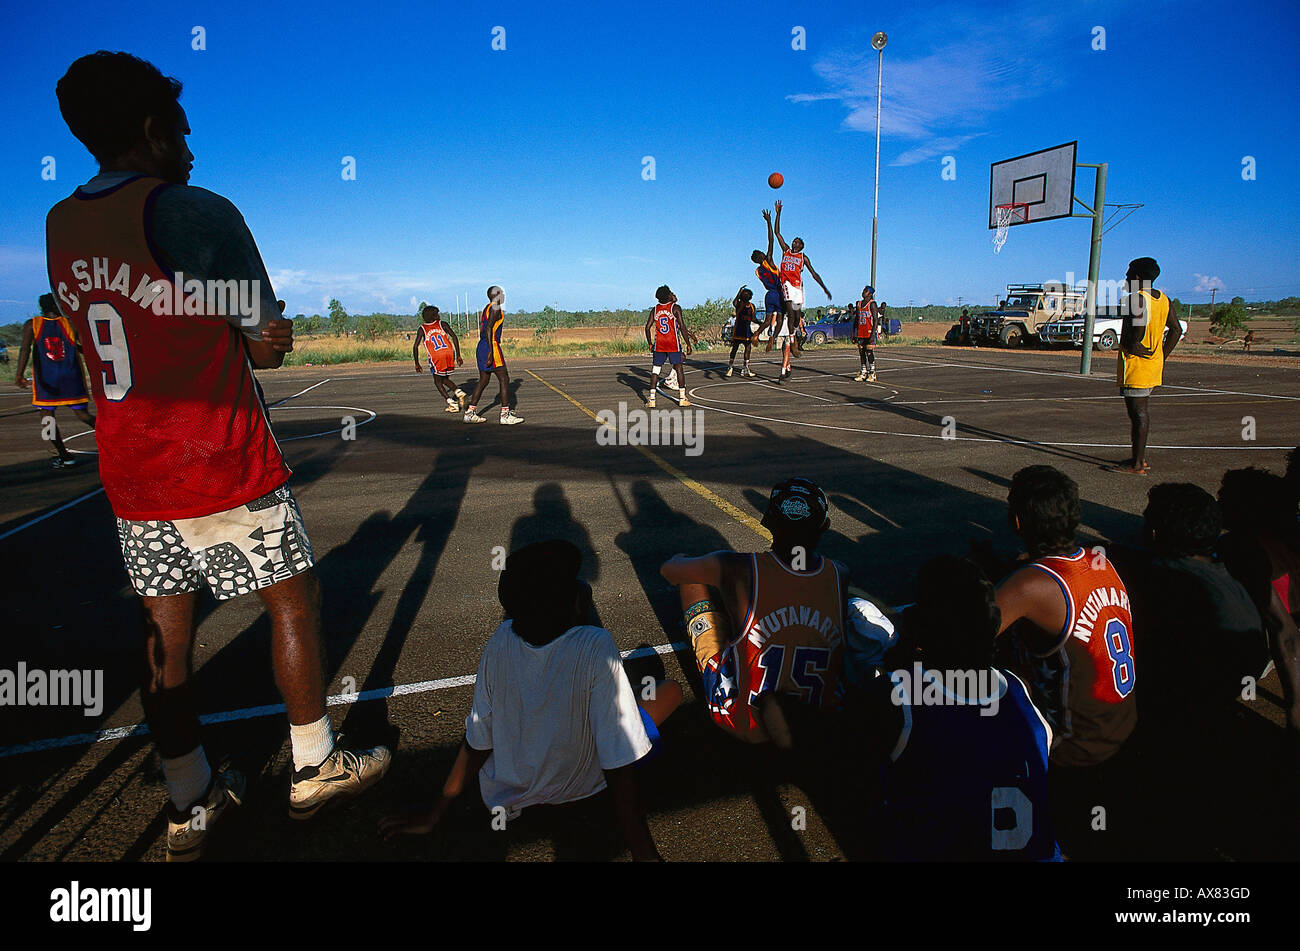 Basketball, Aboriginal Communities, Fitzroy Crossing, Highway 1 Australia - Stock Image